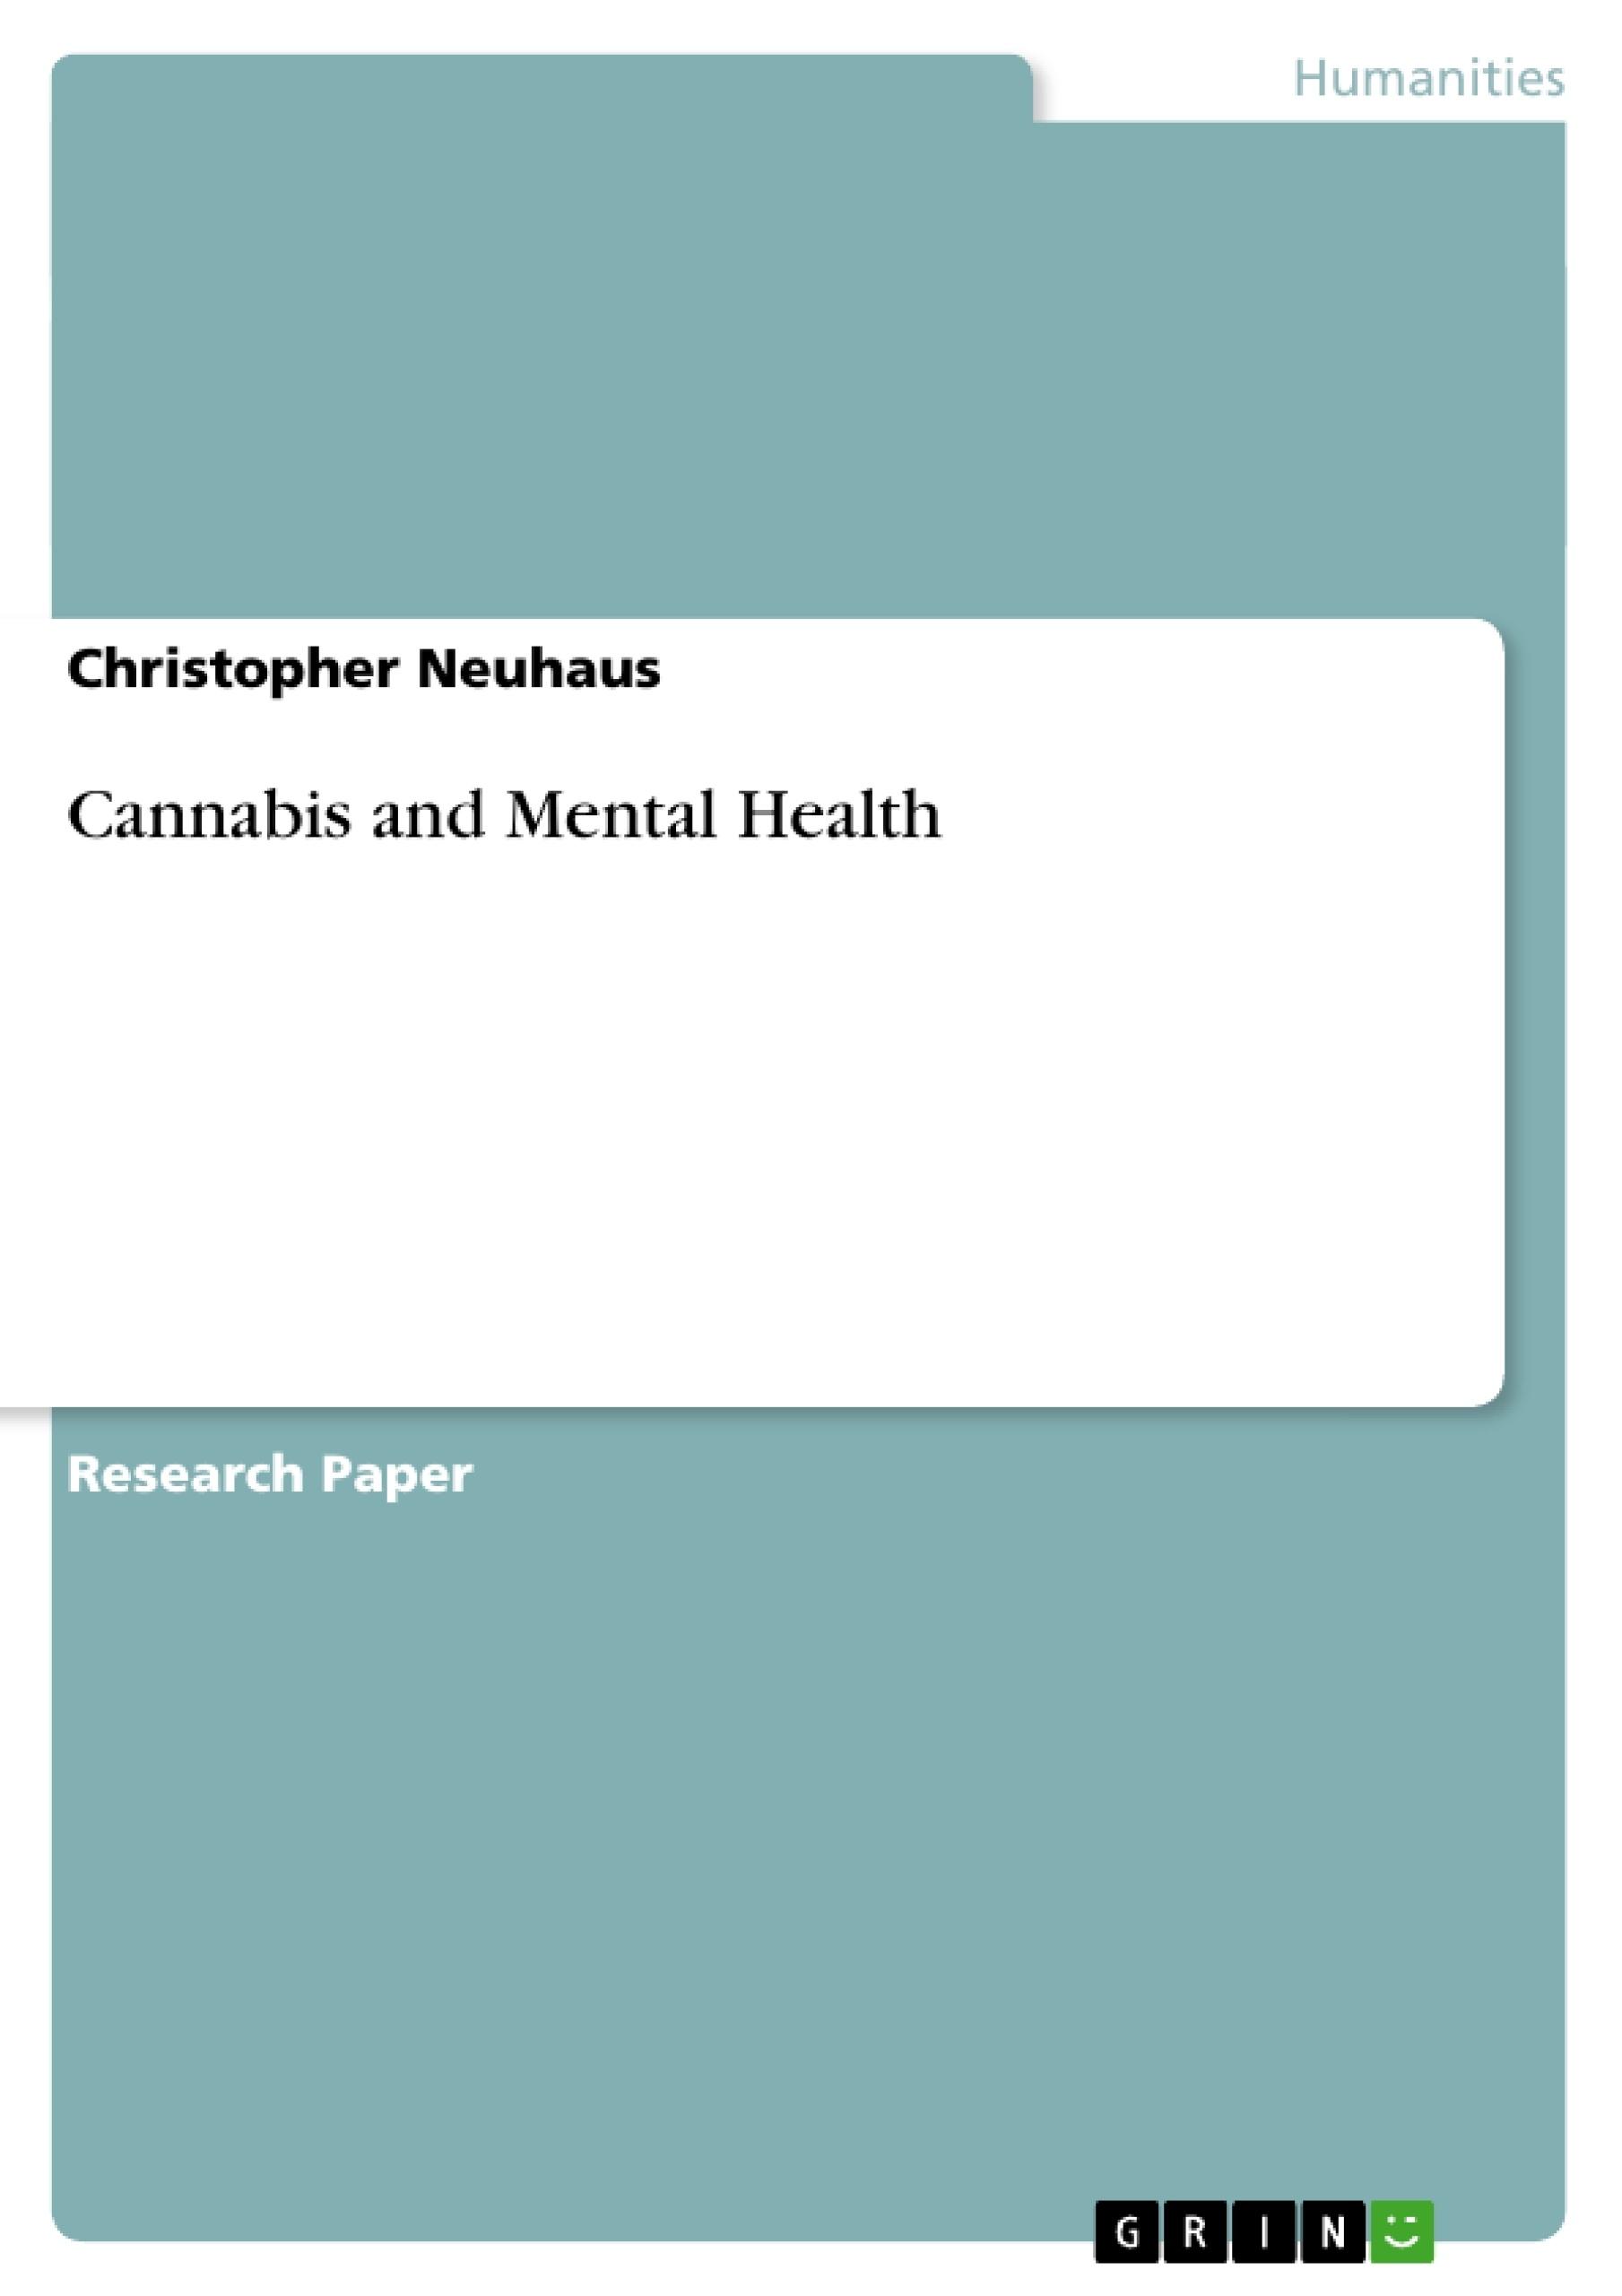 Title: Cannabis and Mental Health